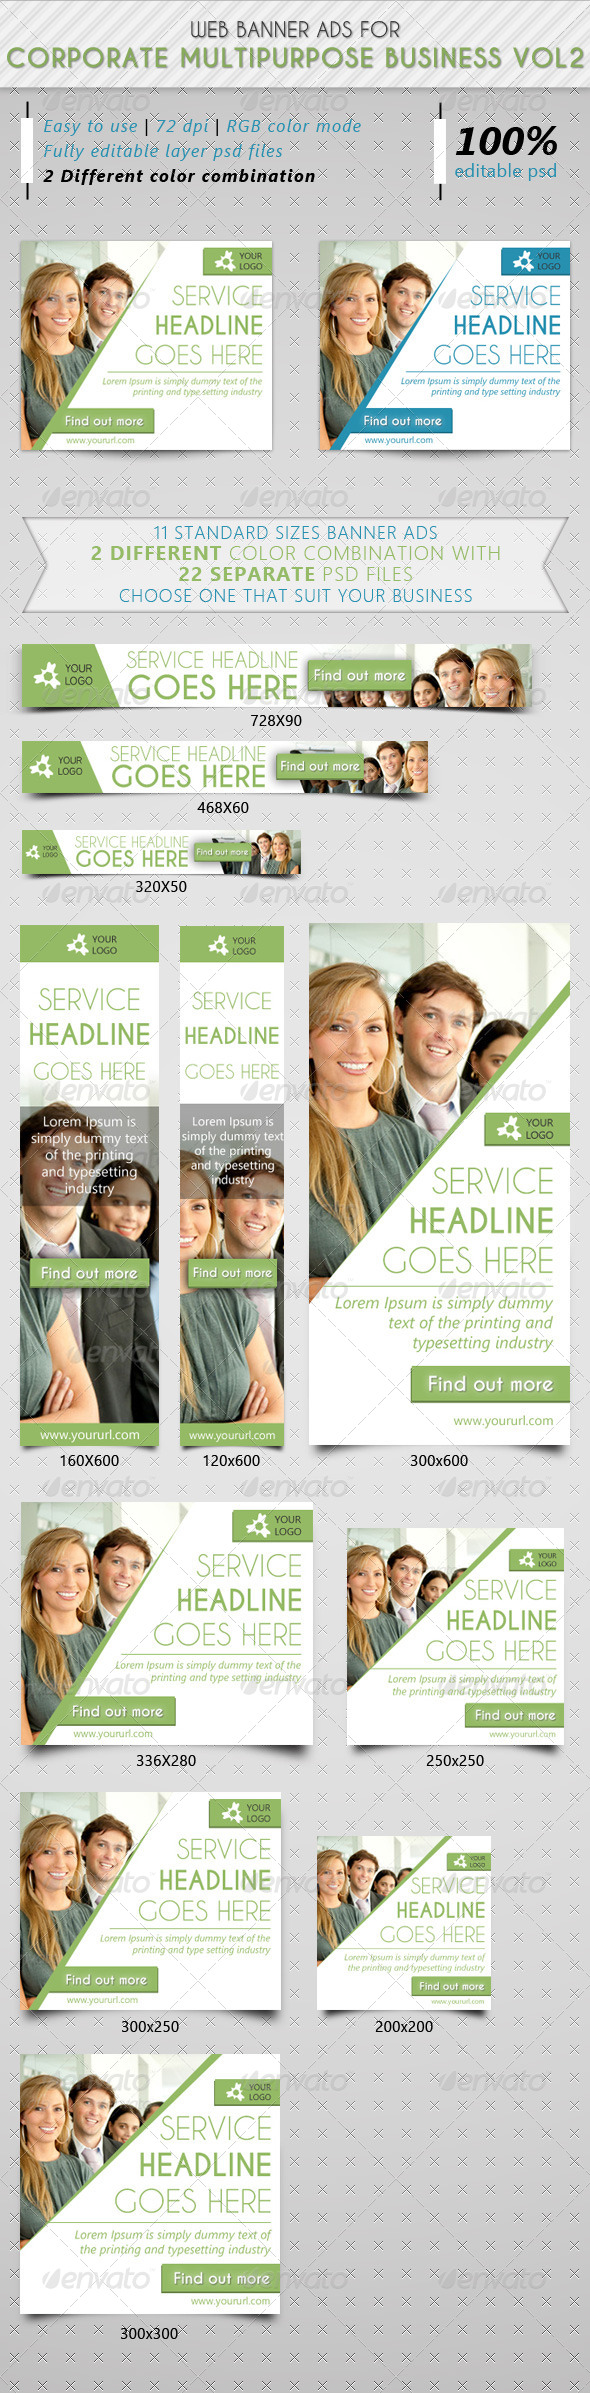 GraphicRiver Corporate Multipurpose Business Ads Vol2 7501367